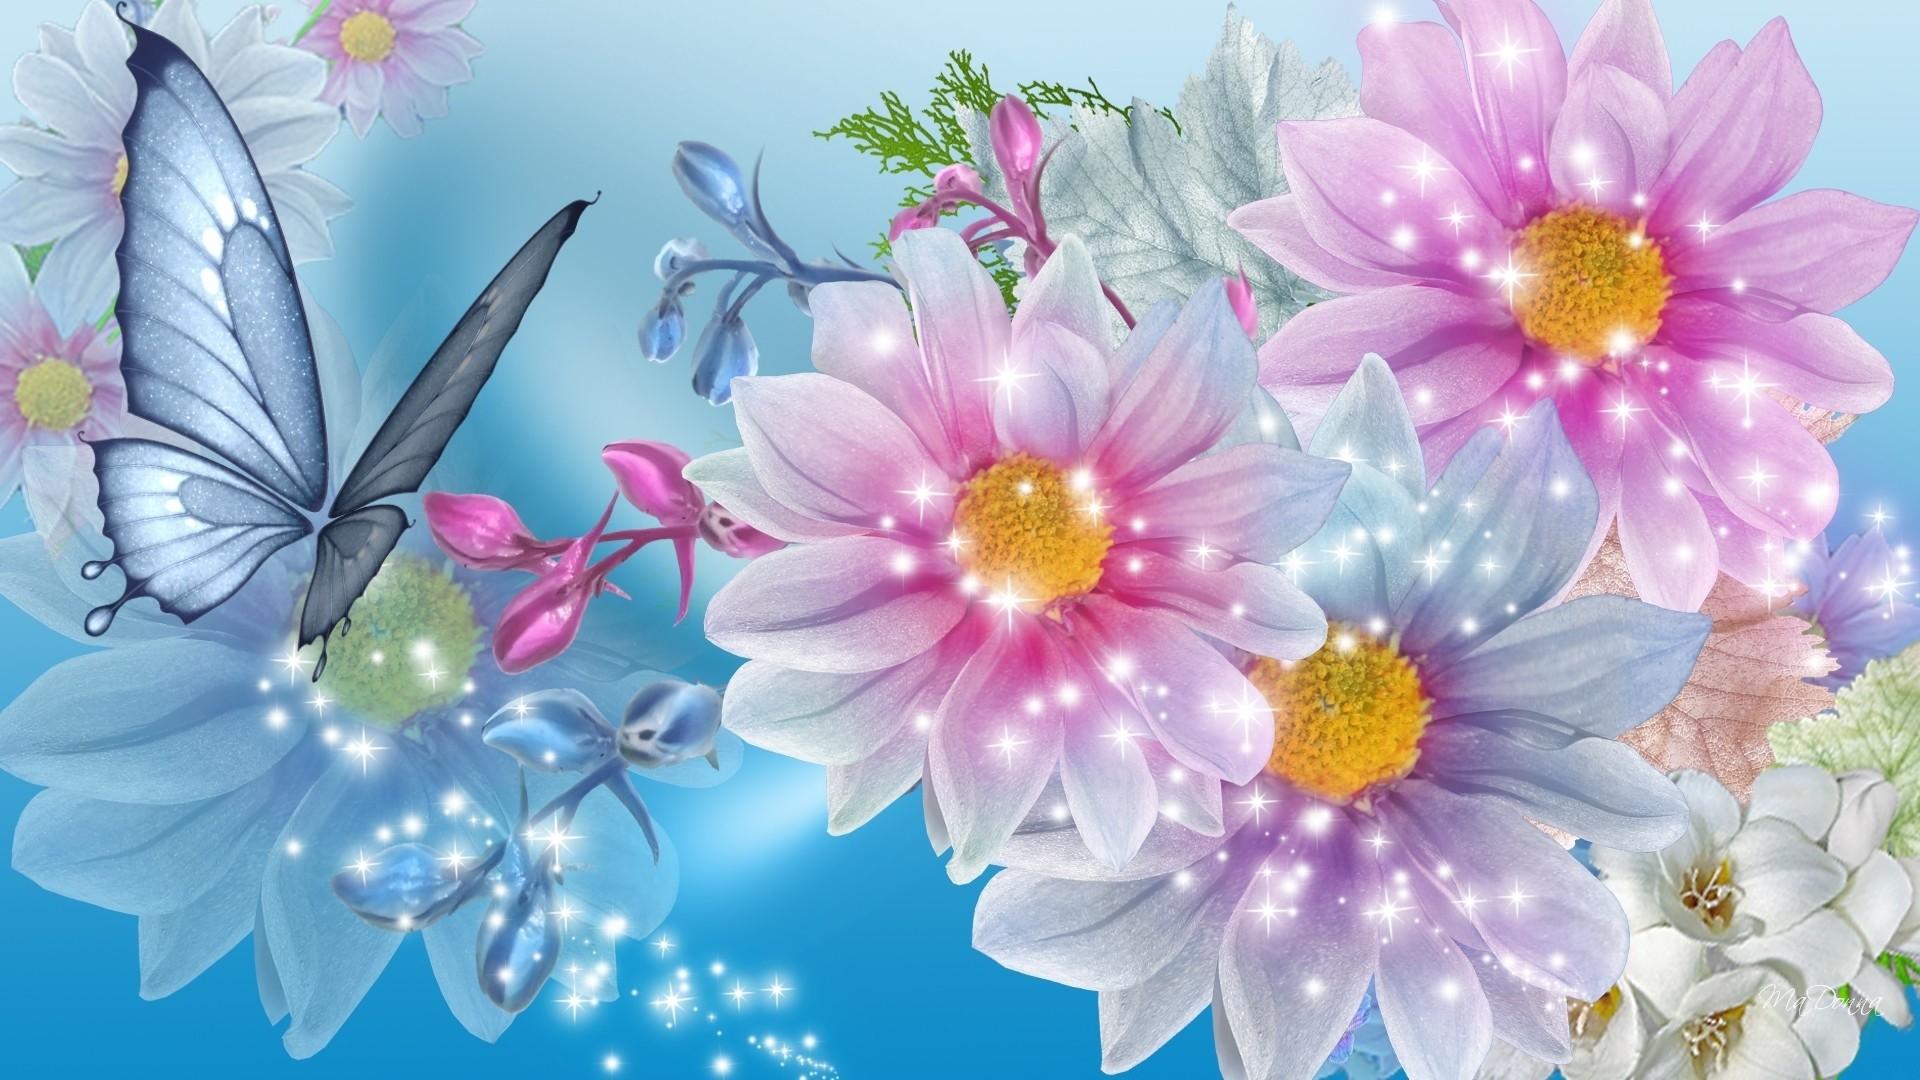 Wallpaper Flowers Wallpapertag